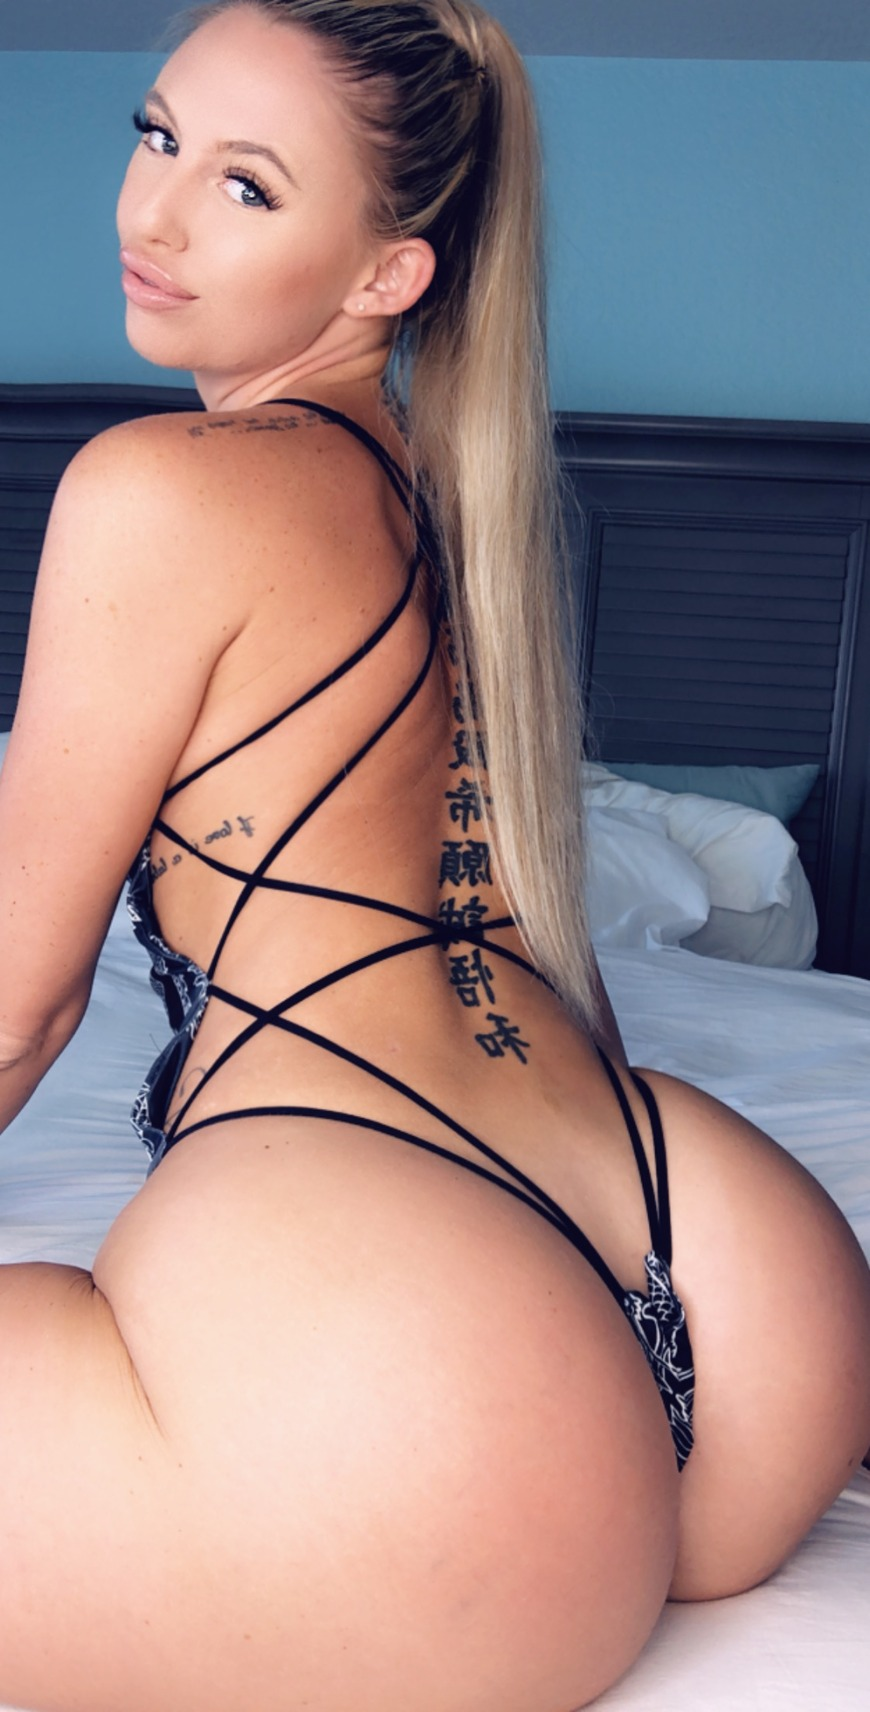 POV 👀 Masturbation Orgasm - clip cover-front